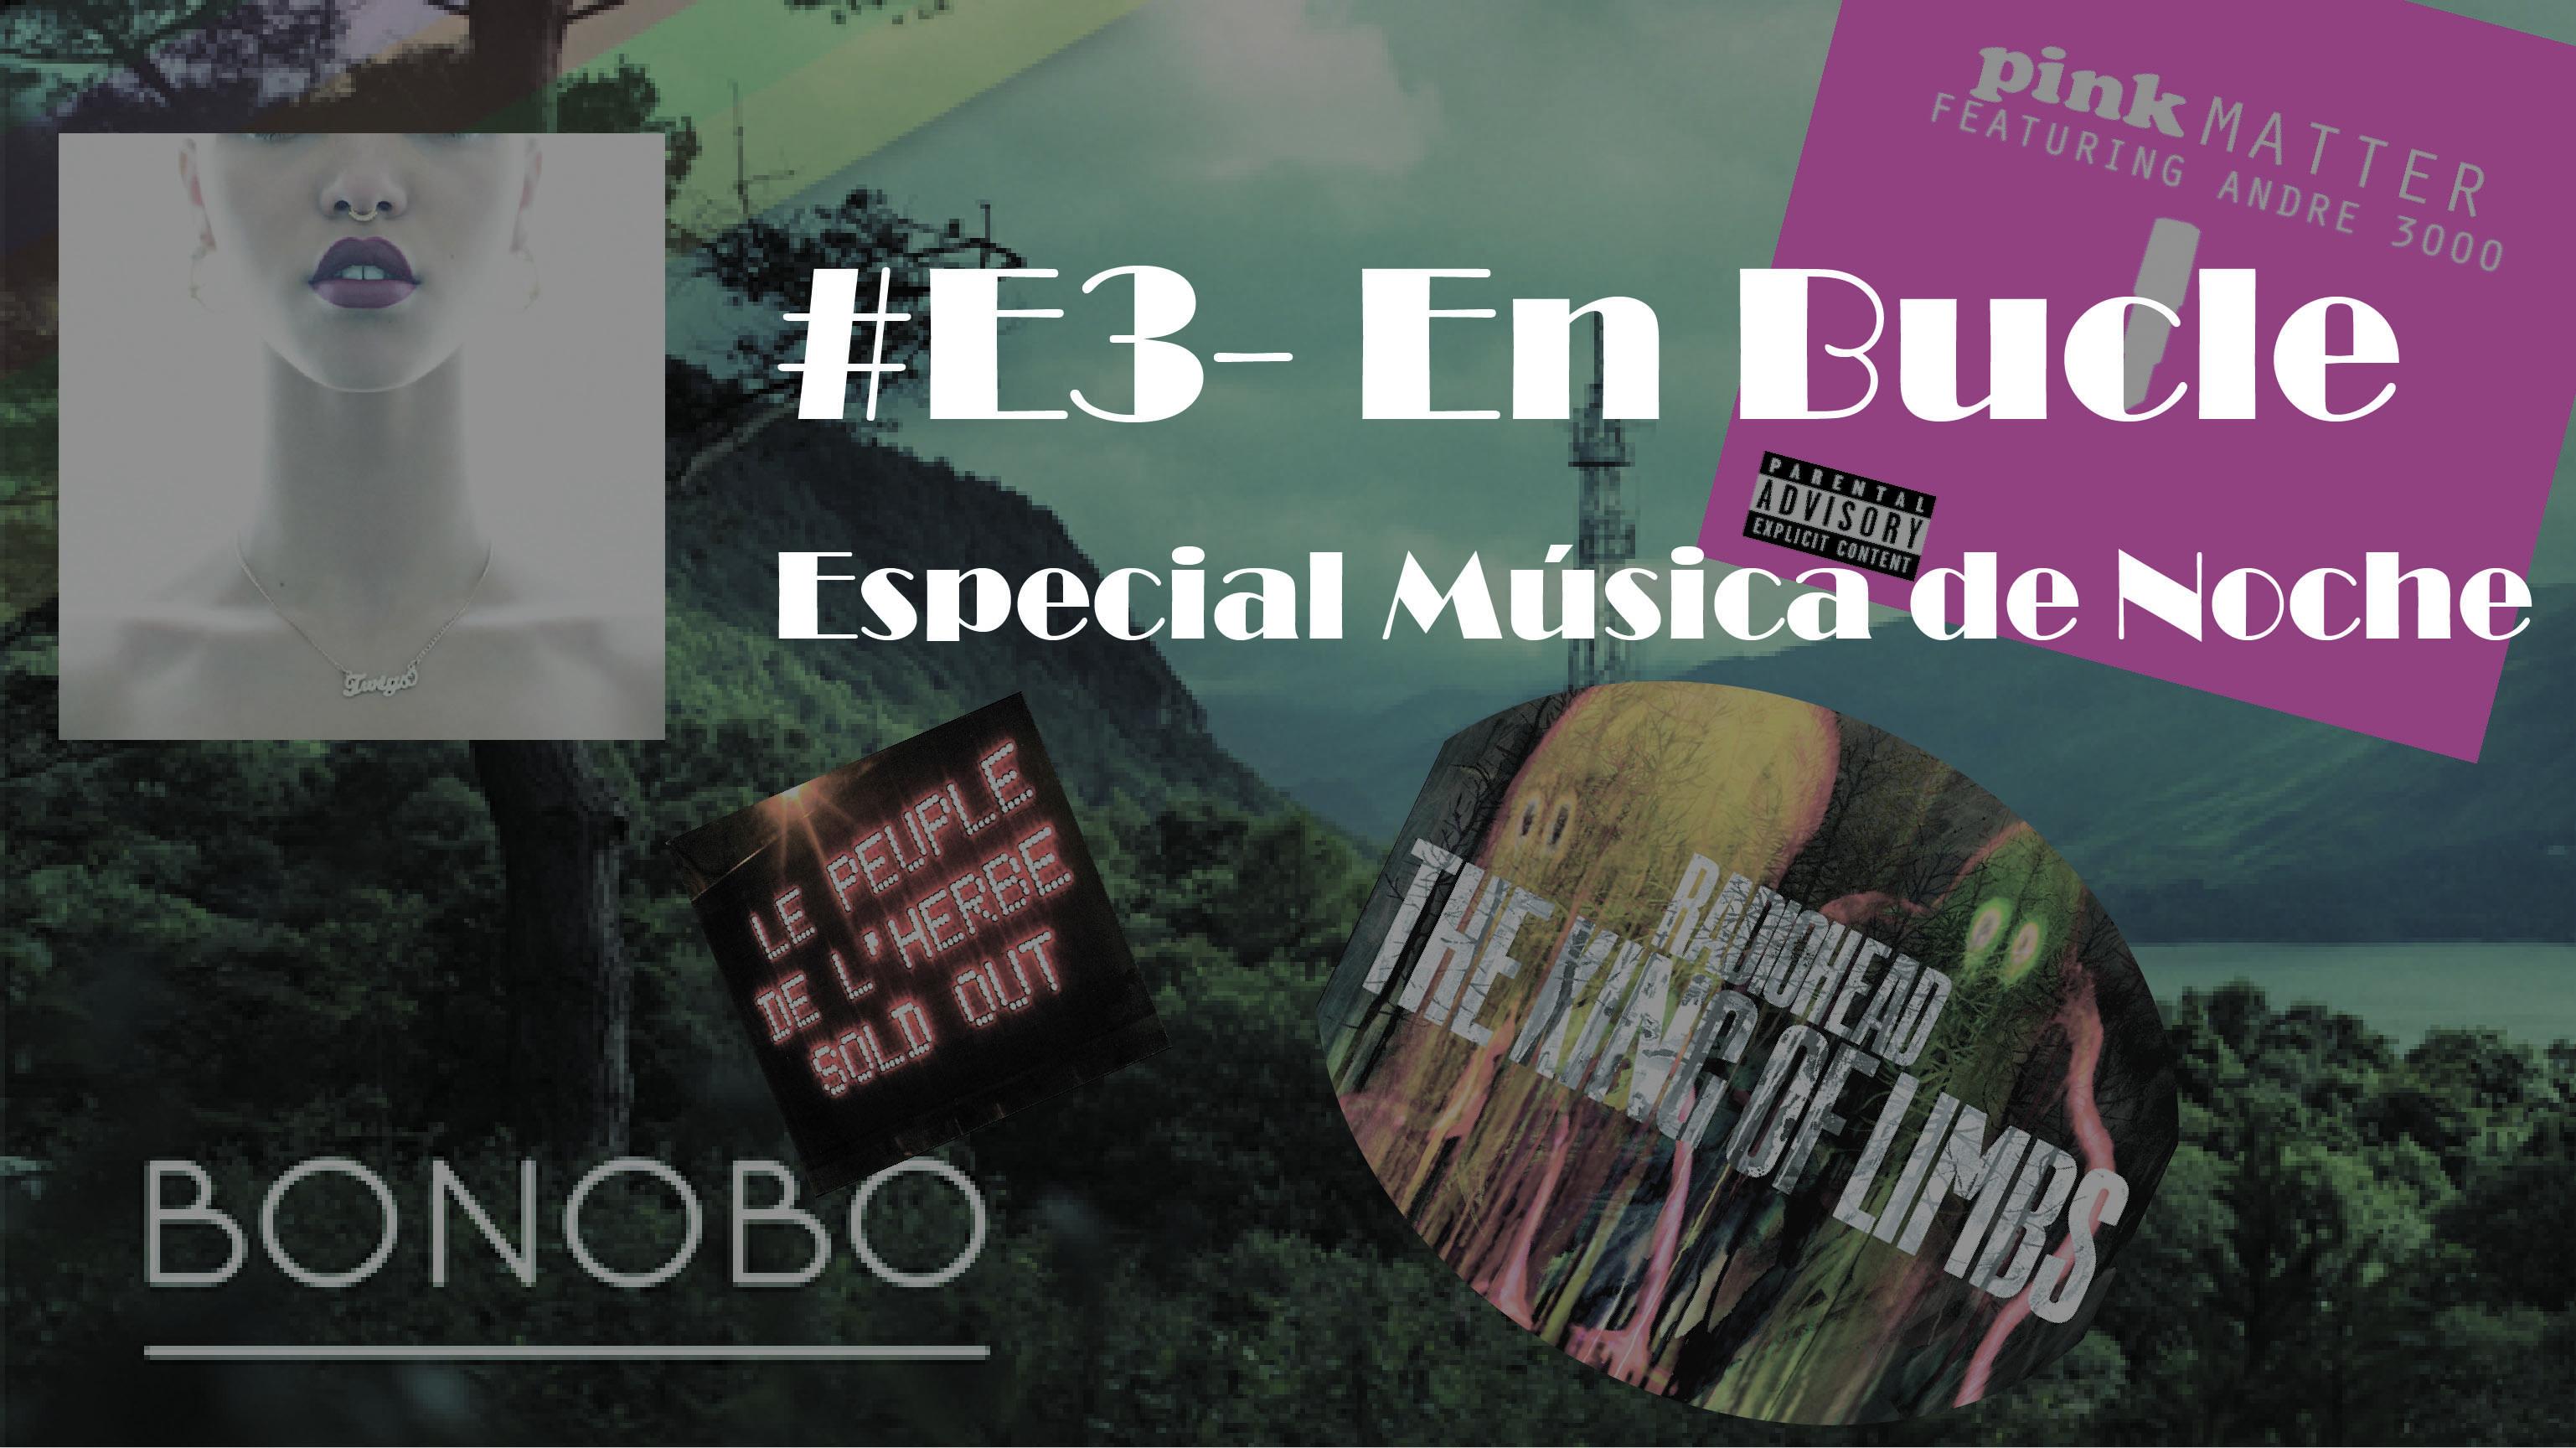 Playlist #E3 – En Boucle Especial Música de Noche